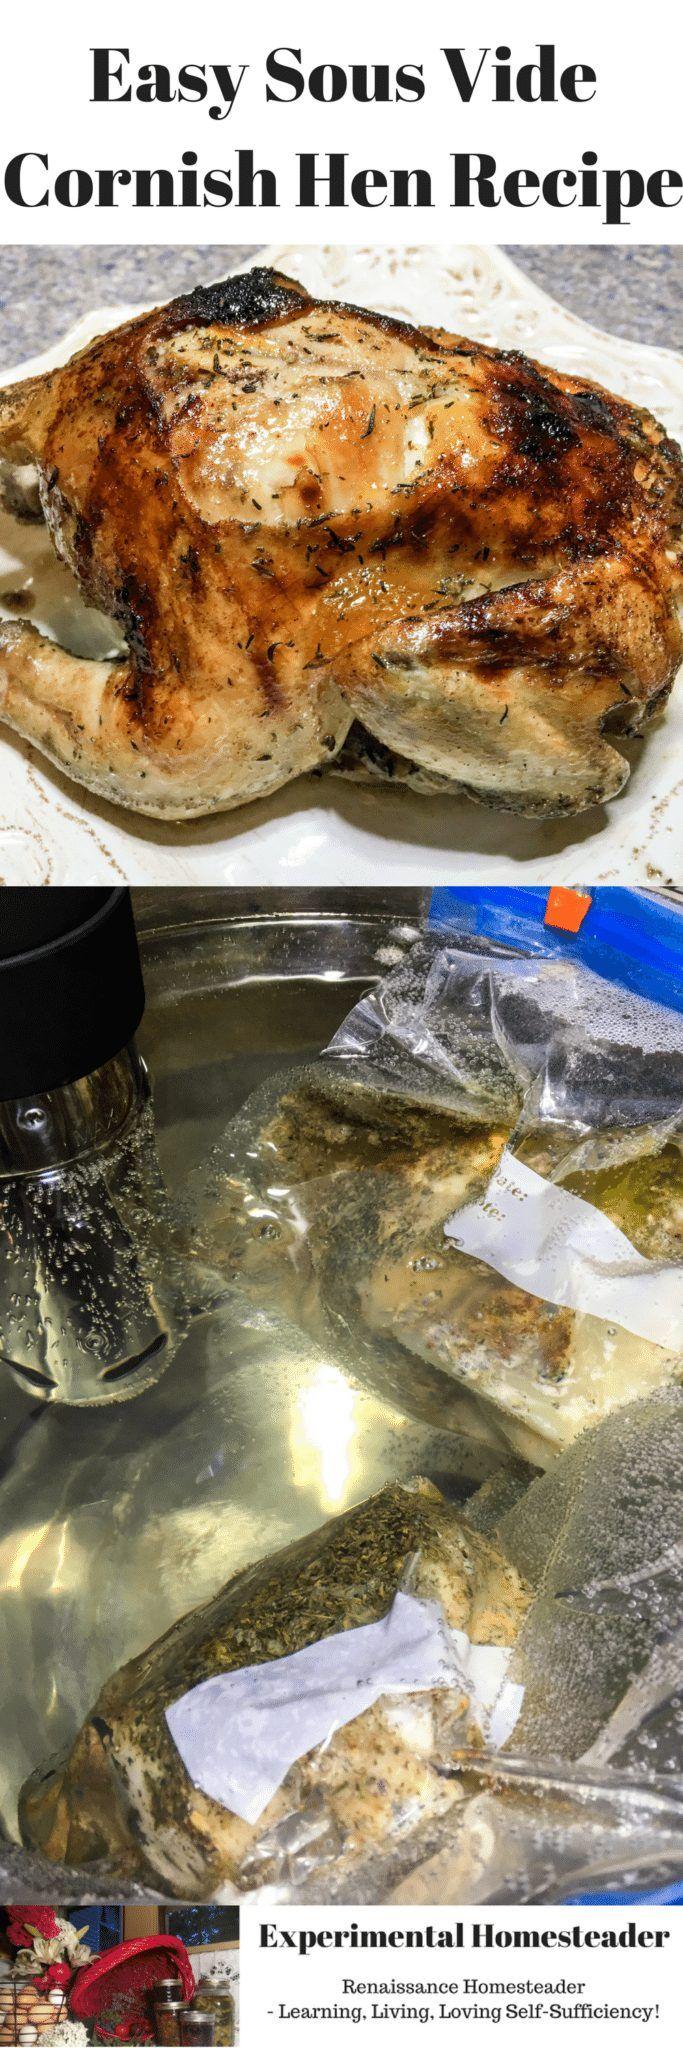 Easy Sous Vide Cornish Hen Recipe Experimental Homesteader Recipe Cornish Hen Recipe Sous Vide Recipes Sous Vide